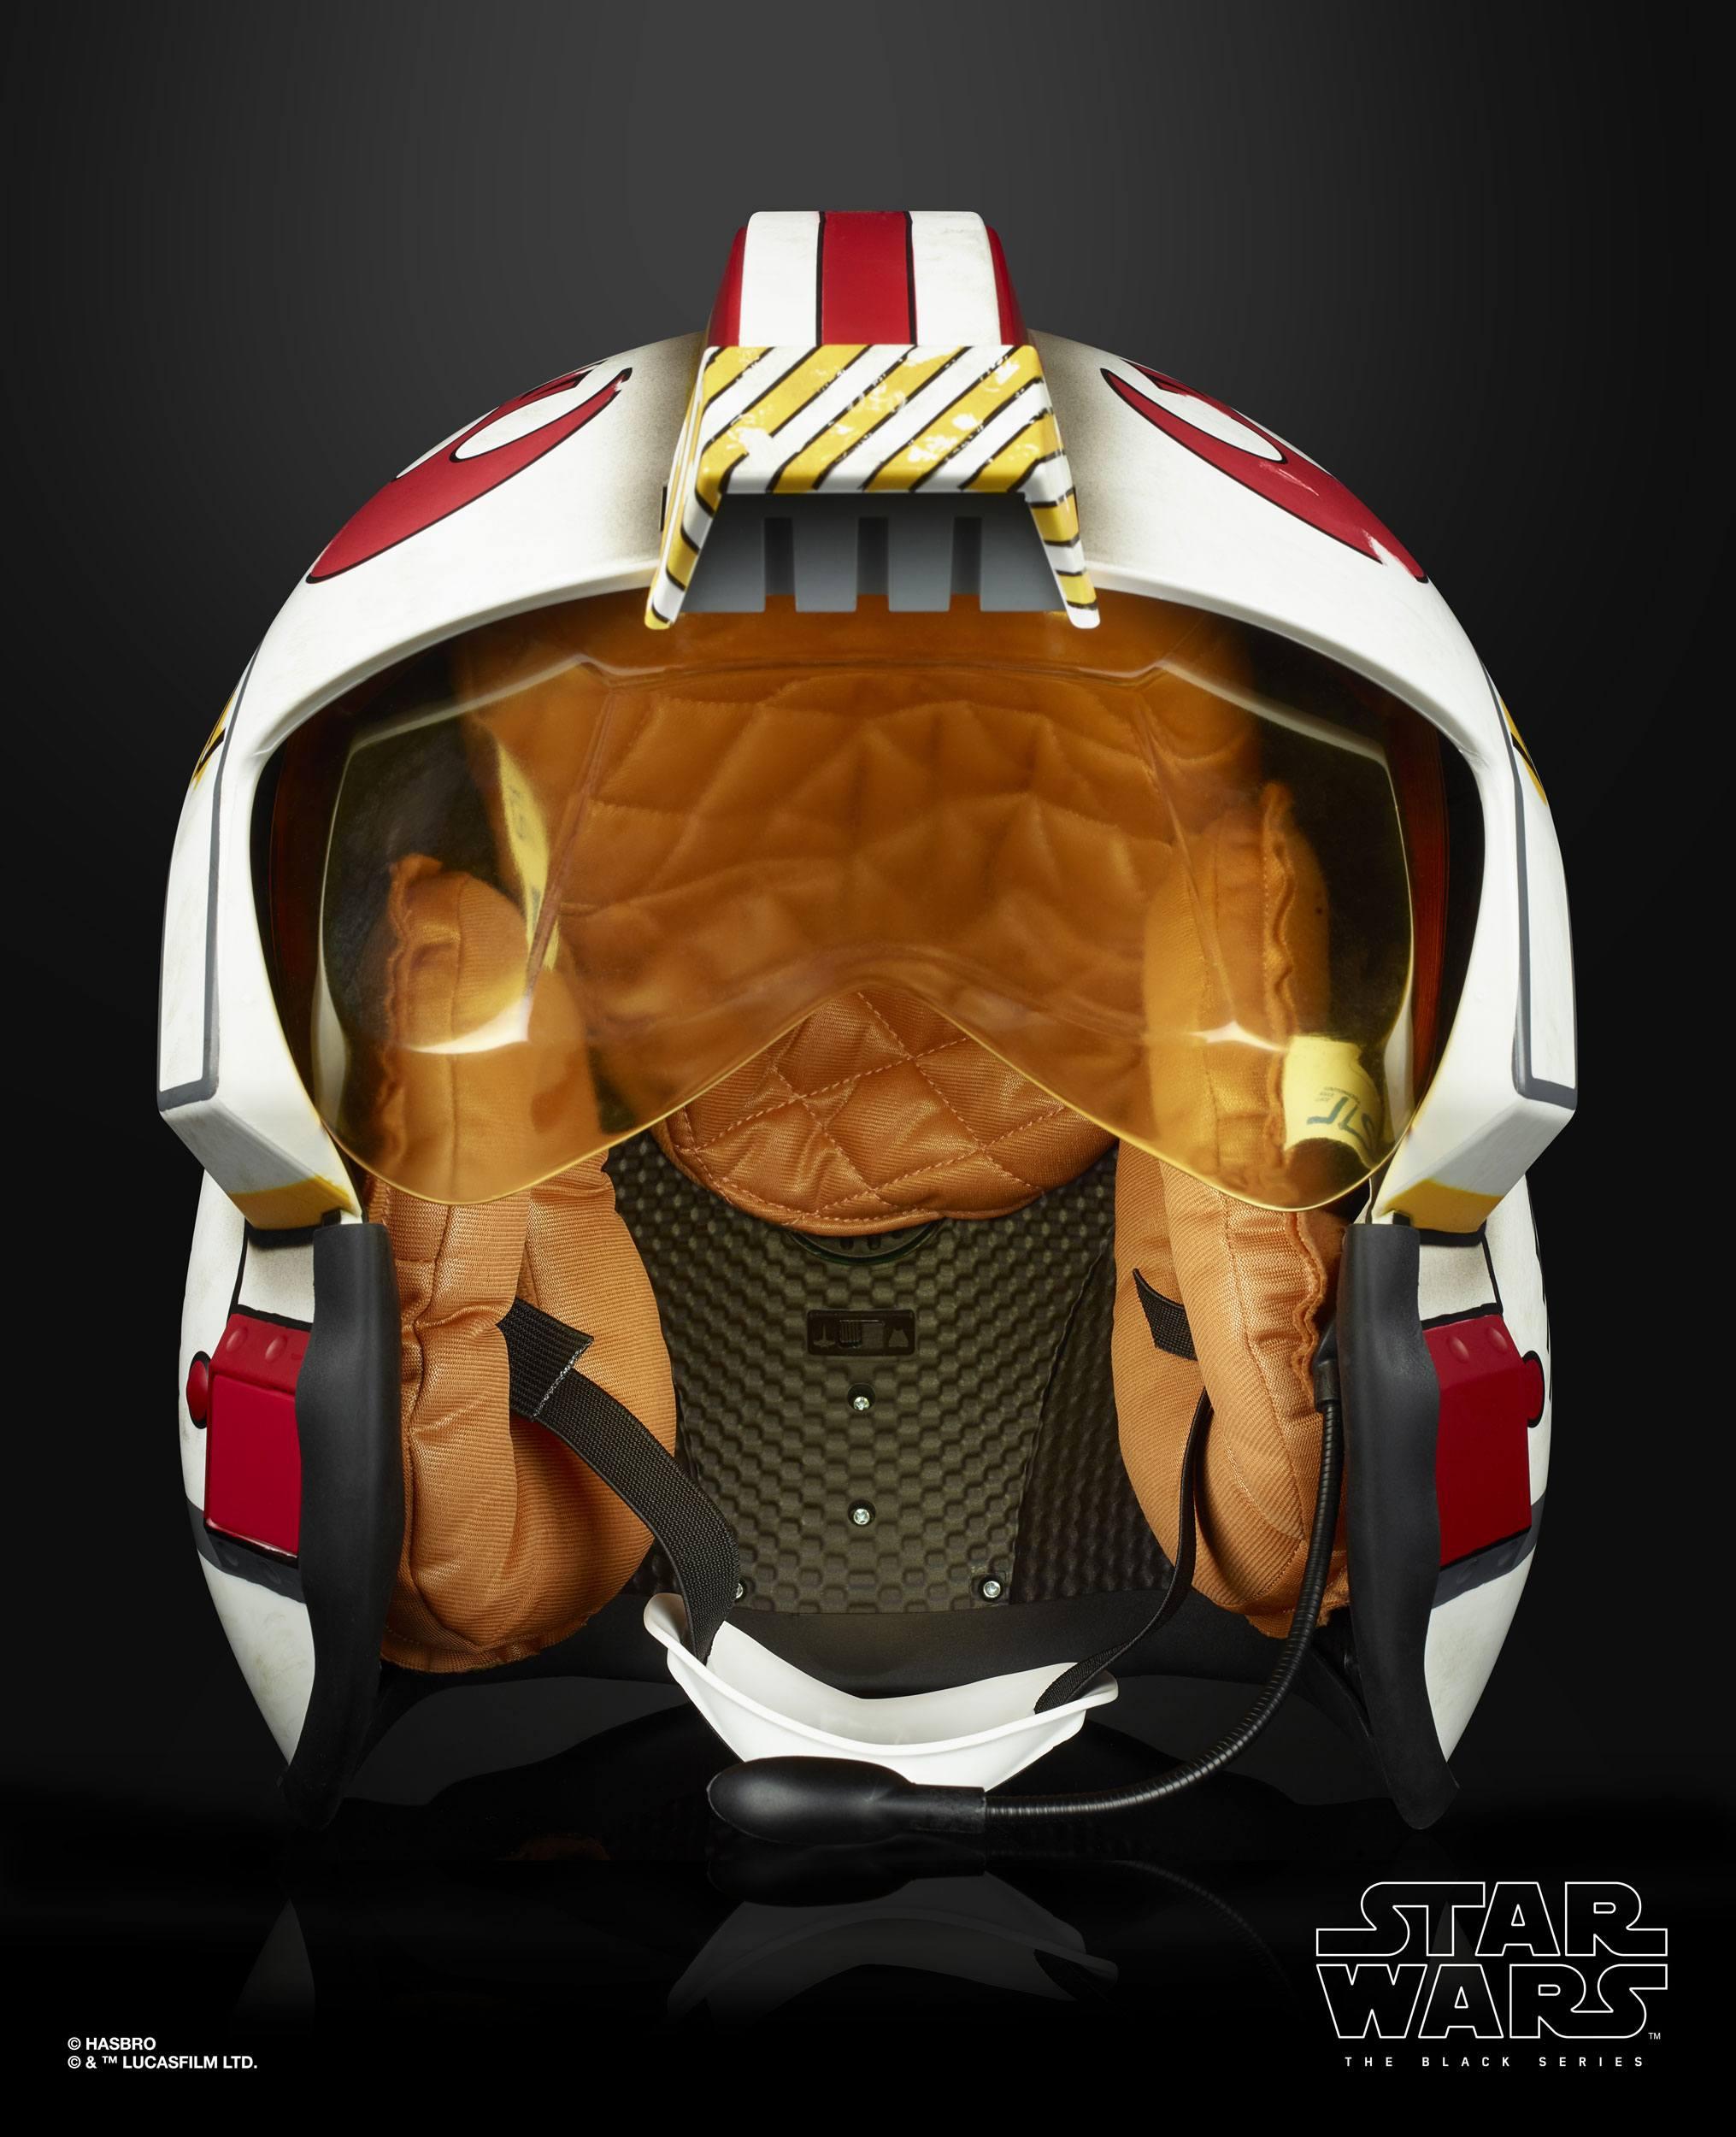 star wars black series Luke Skywalker battle helmet pre order for early October